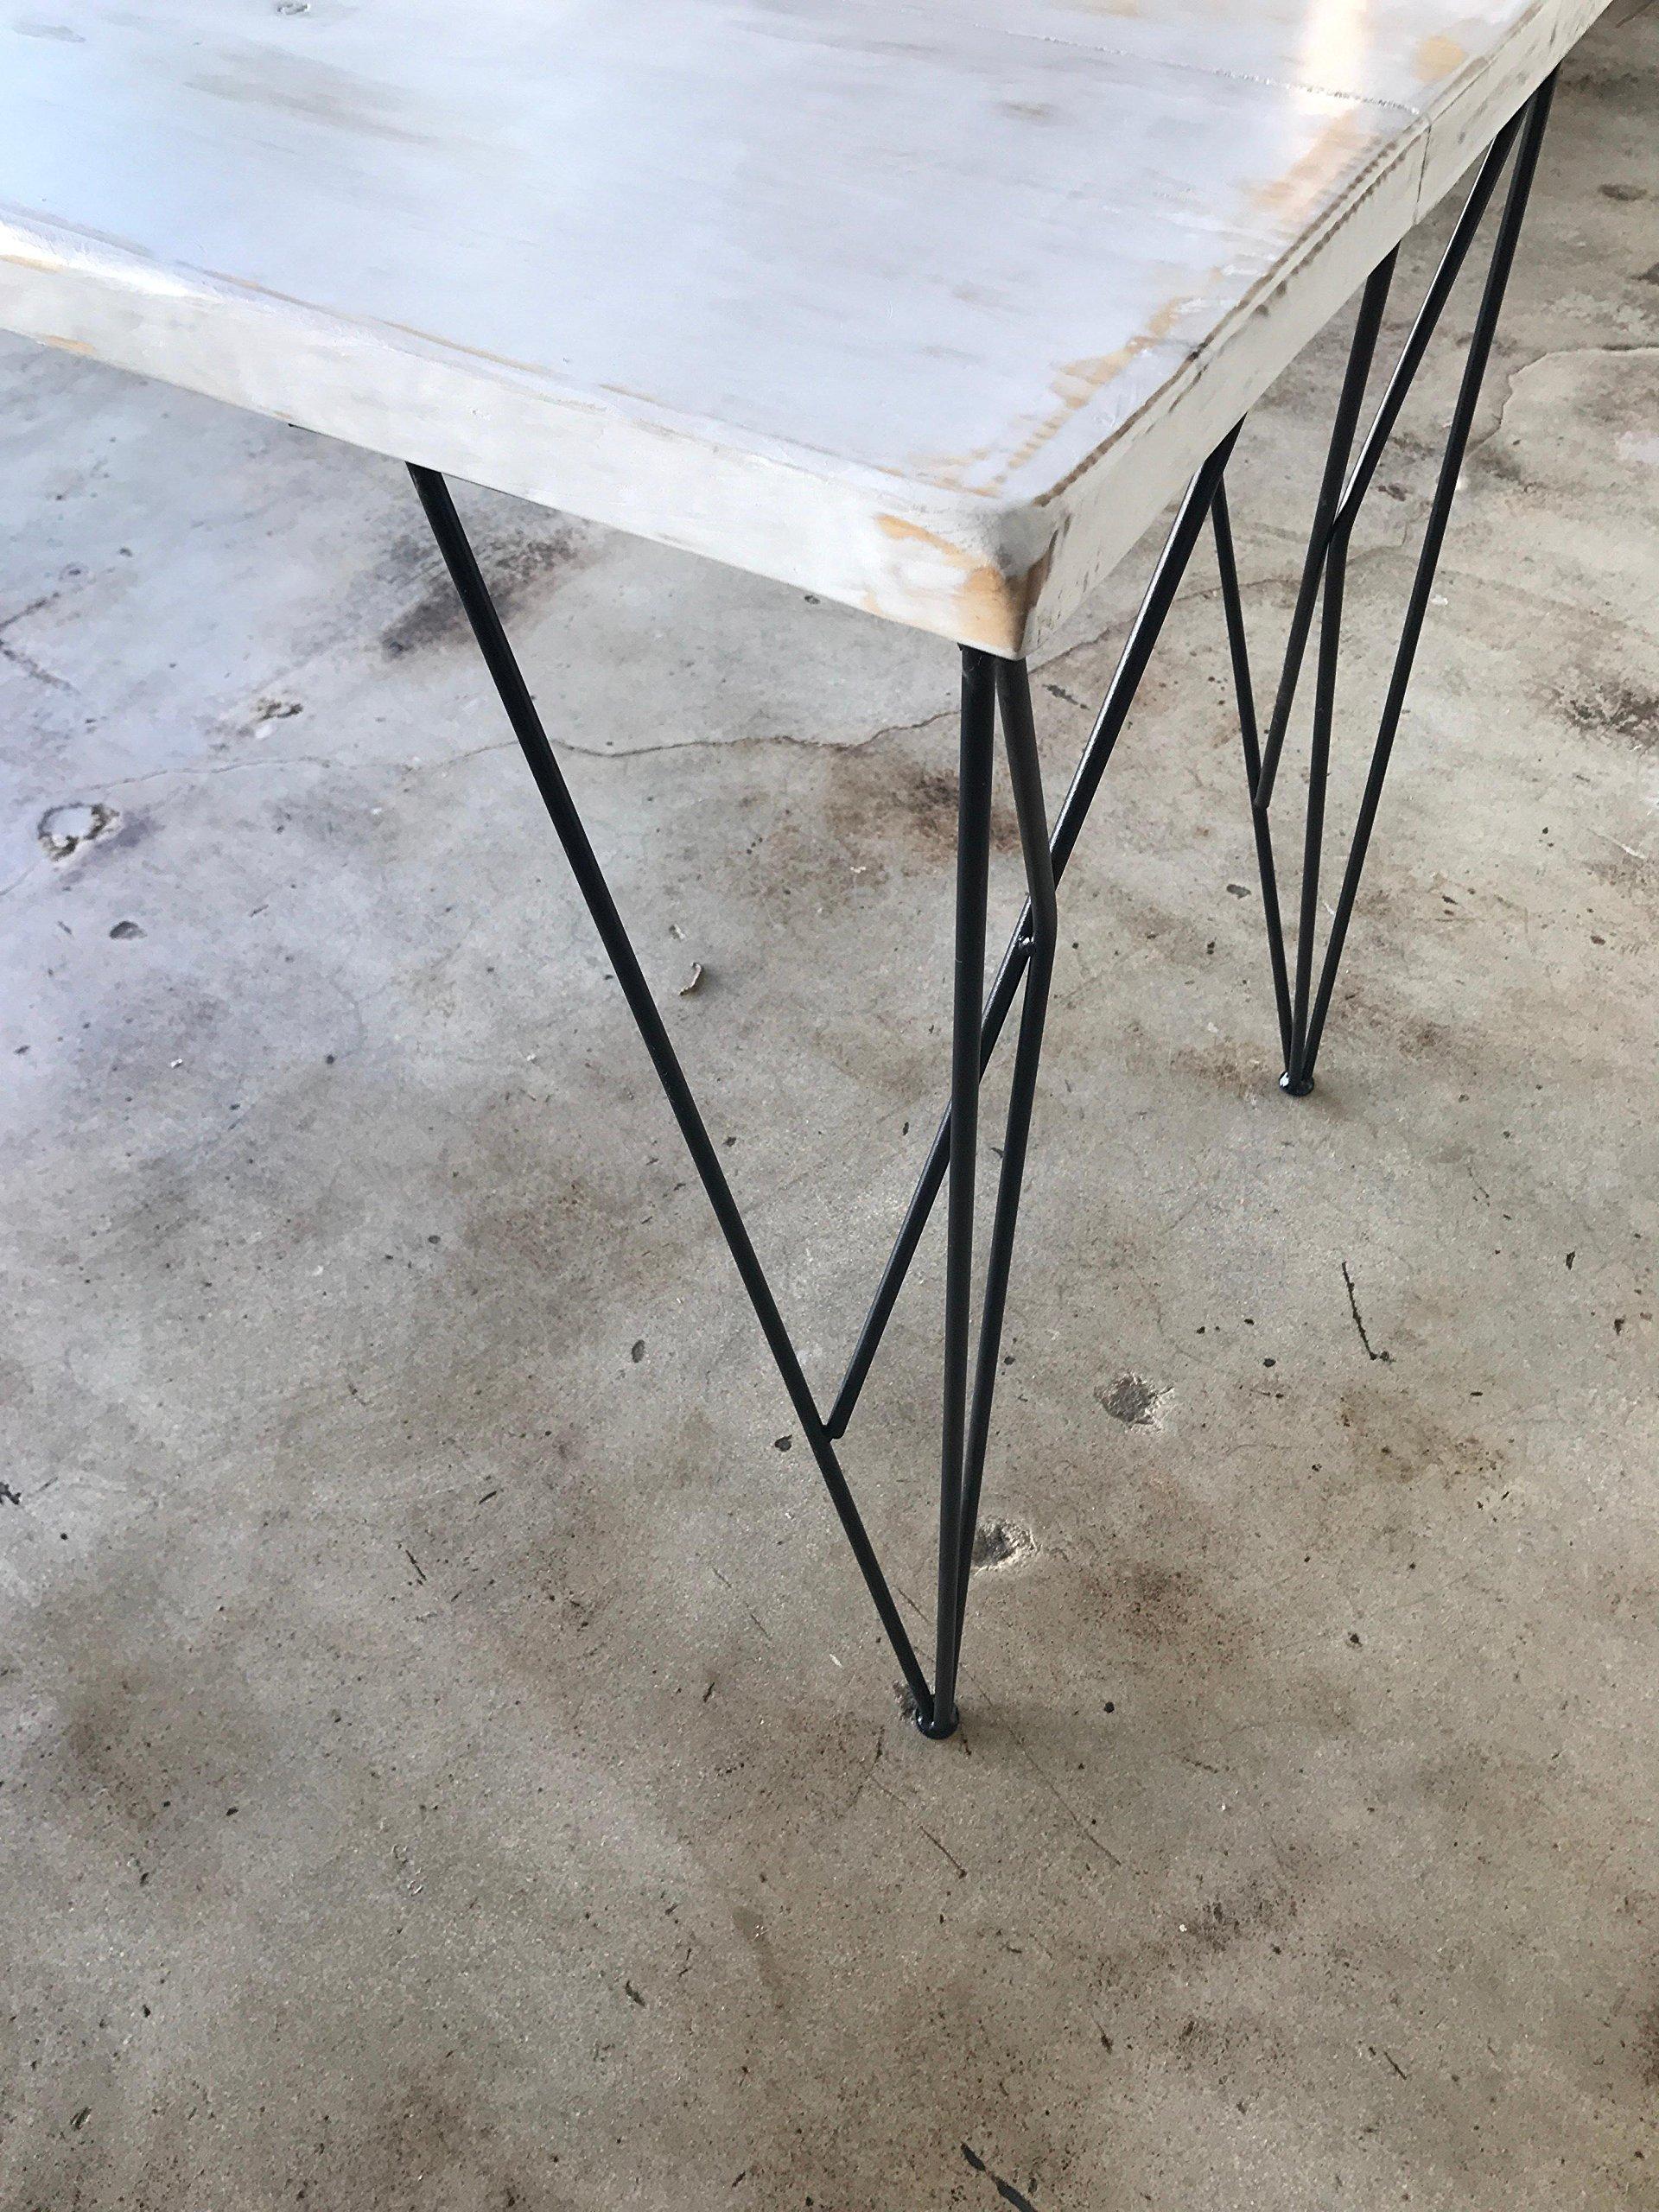 UMBUZÖ Steel Spider Web Hairpin Legs (Set of 4) by UMBUZÖ (Image #5)